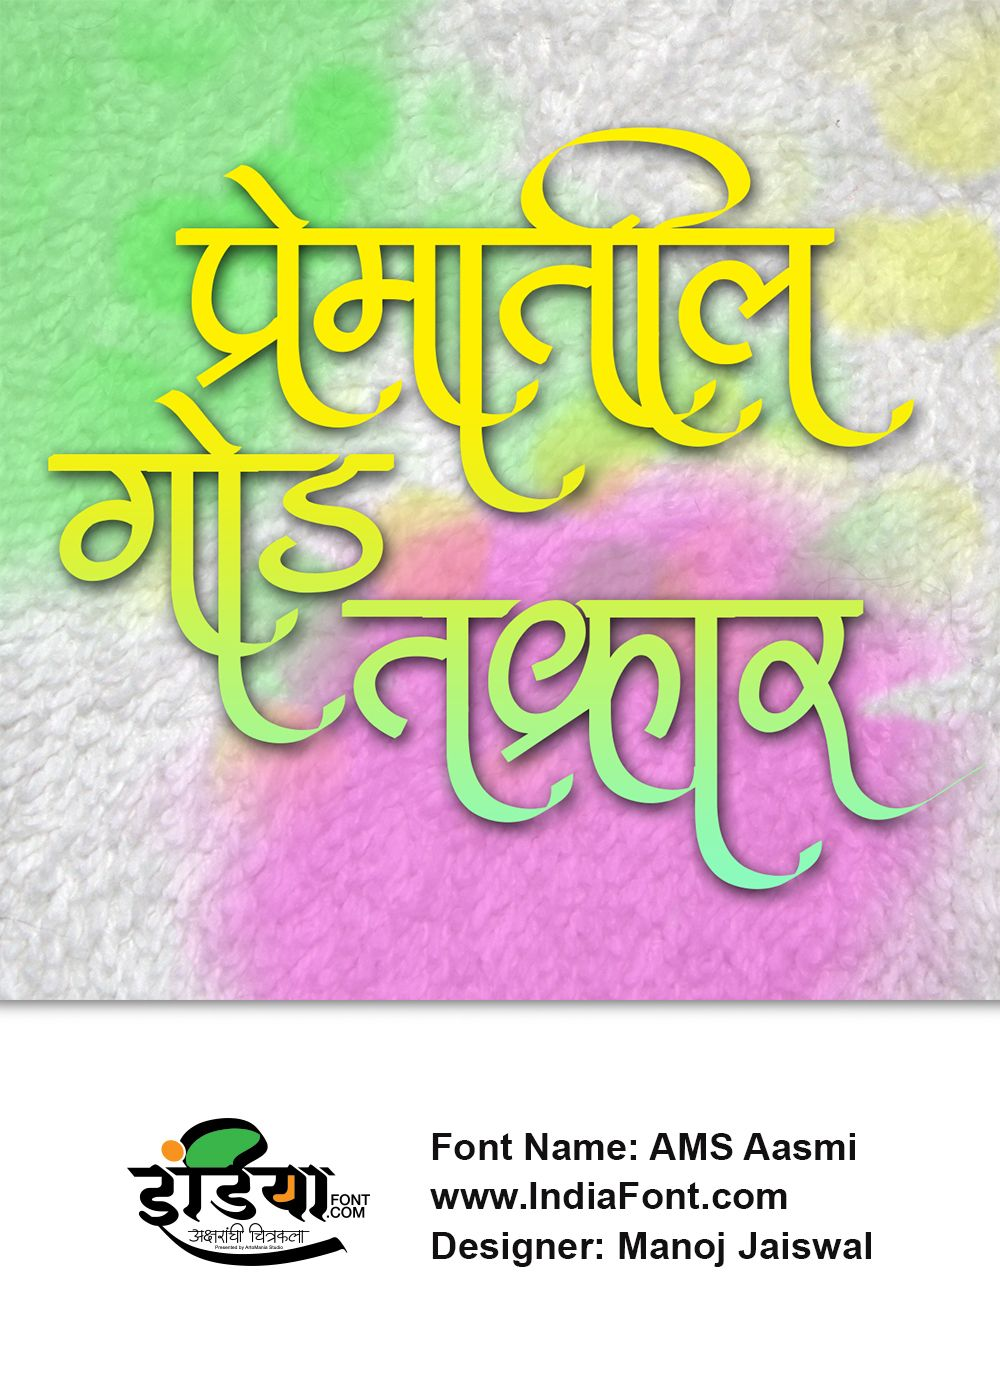 IndiaFont Gallery | Fonts | Hindi calligraphy fonts, Font